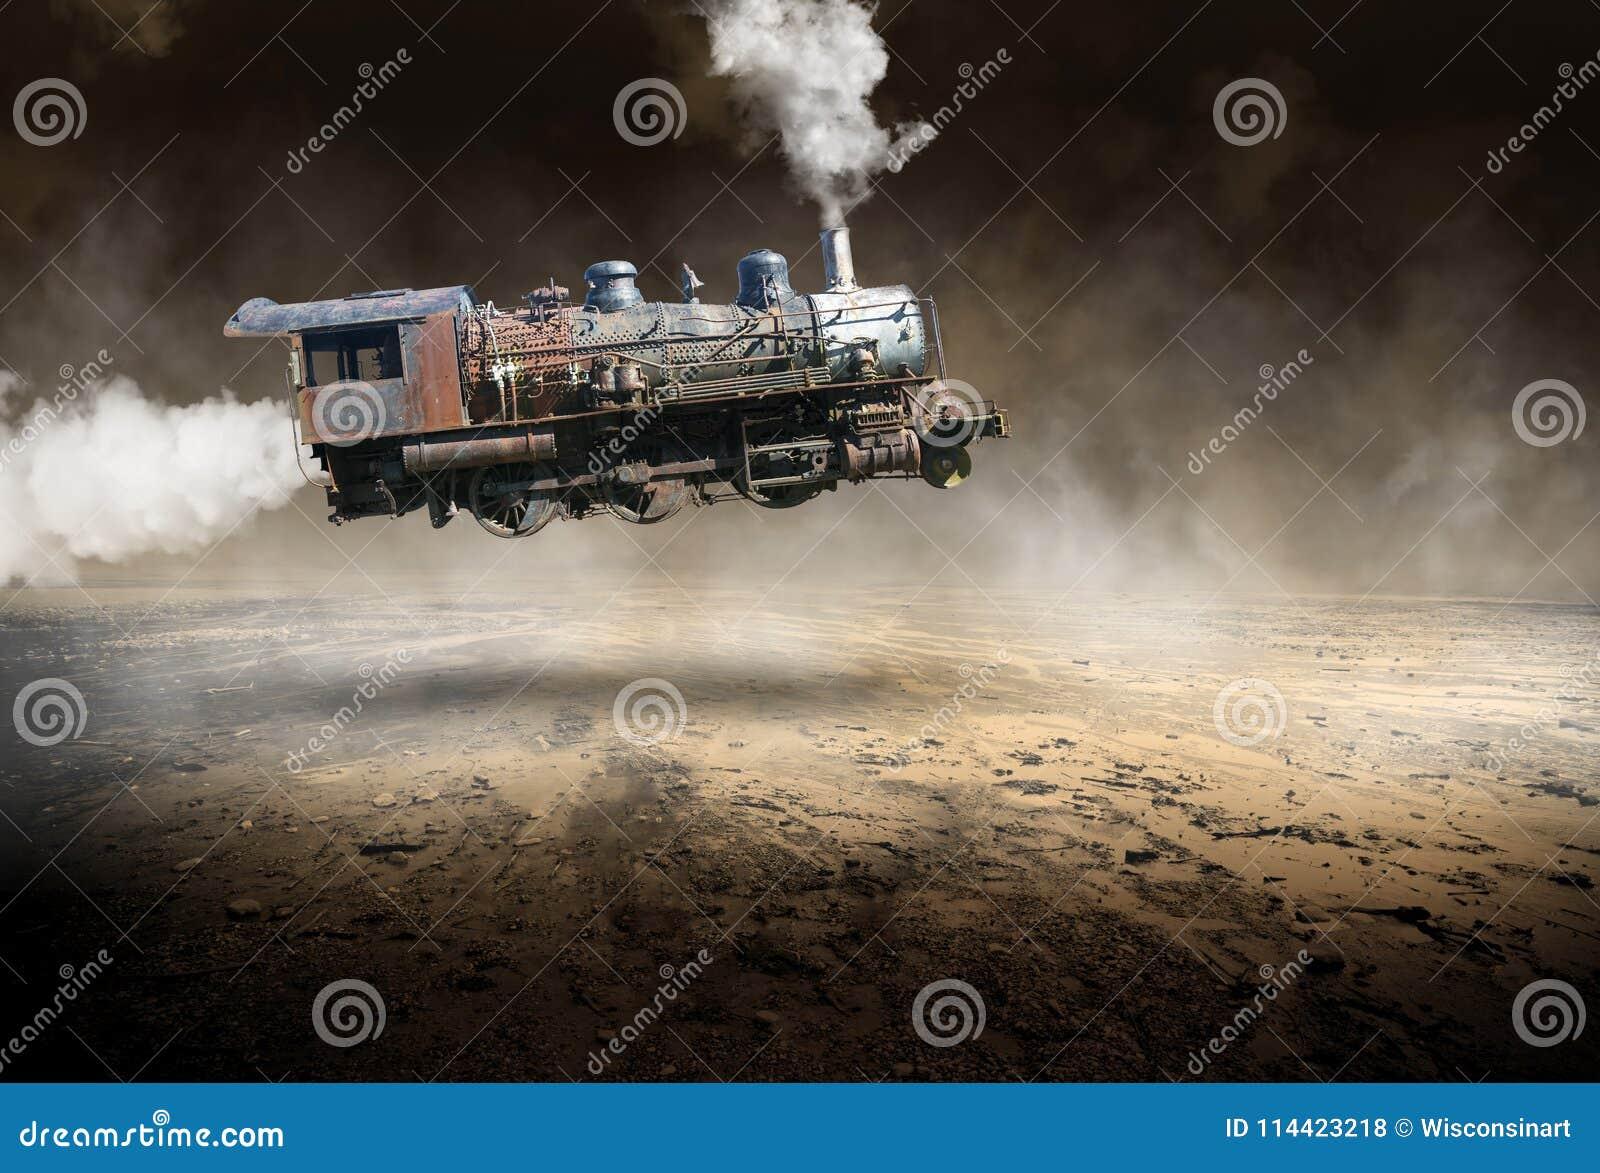 Surreal Vintage Train Locomotive, Flying